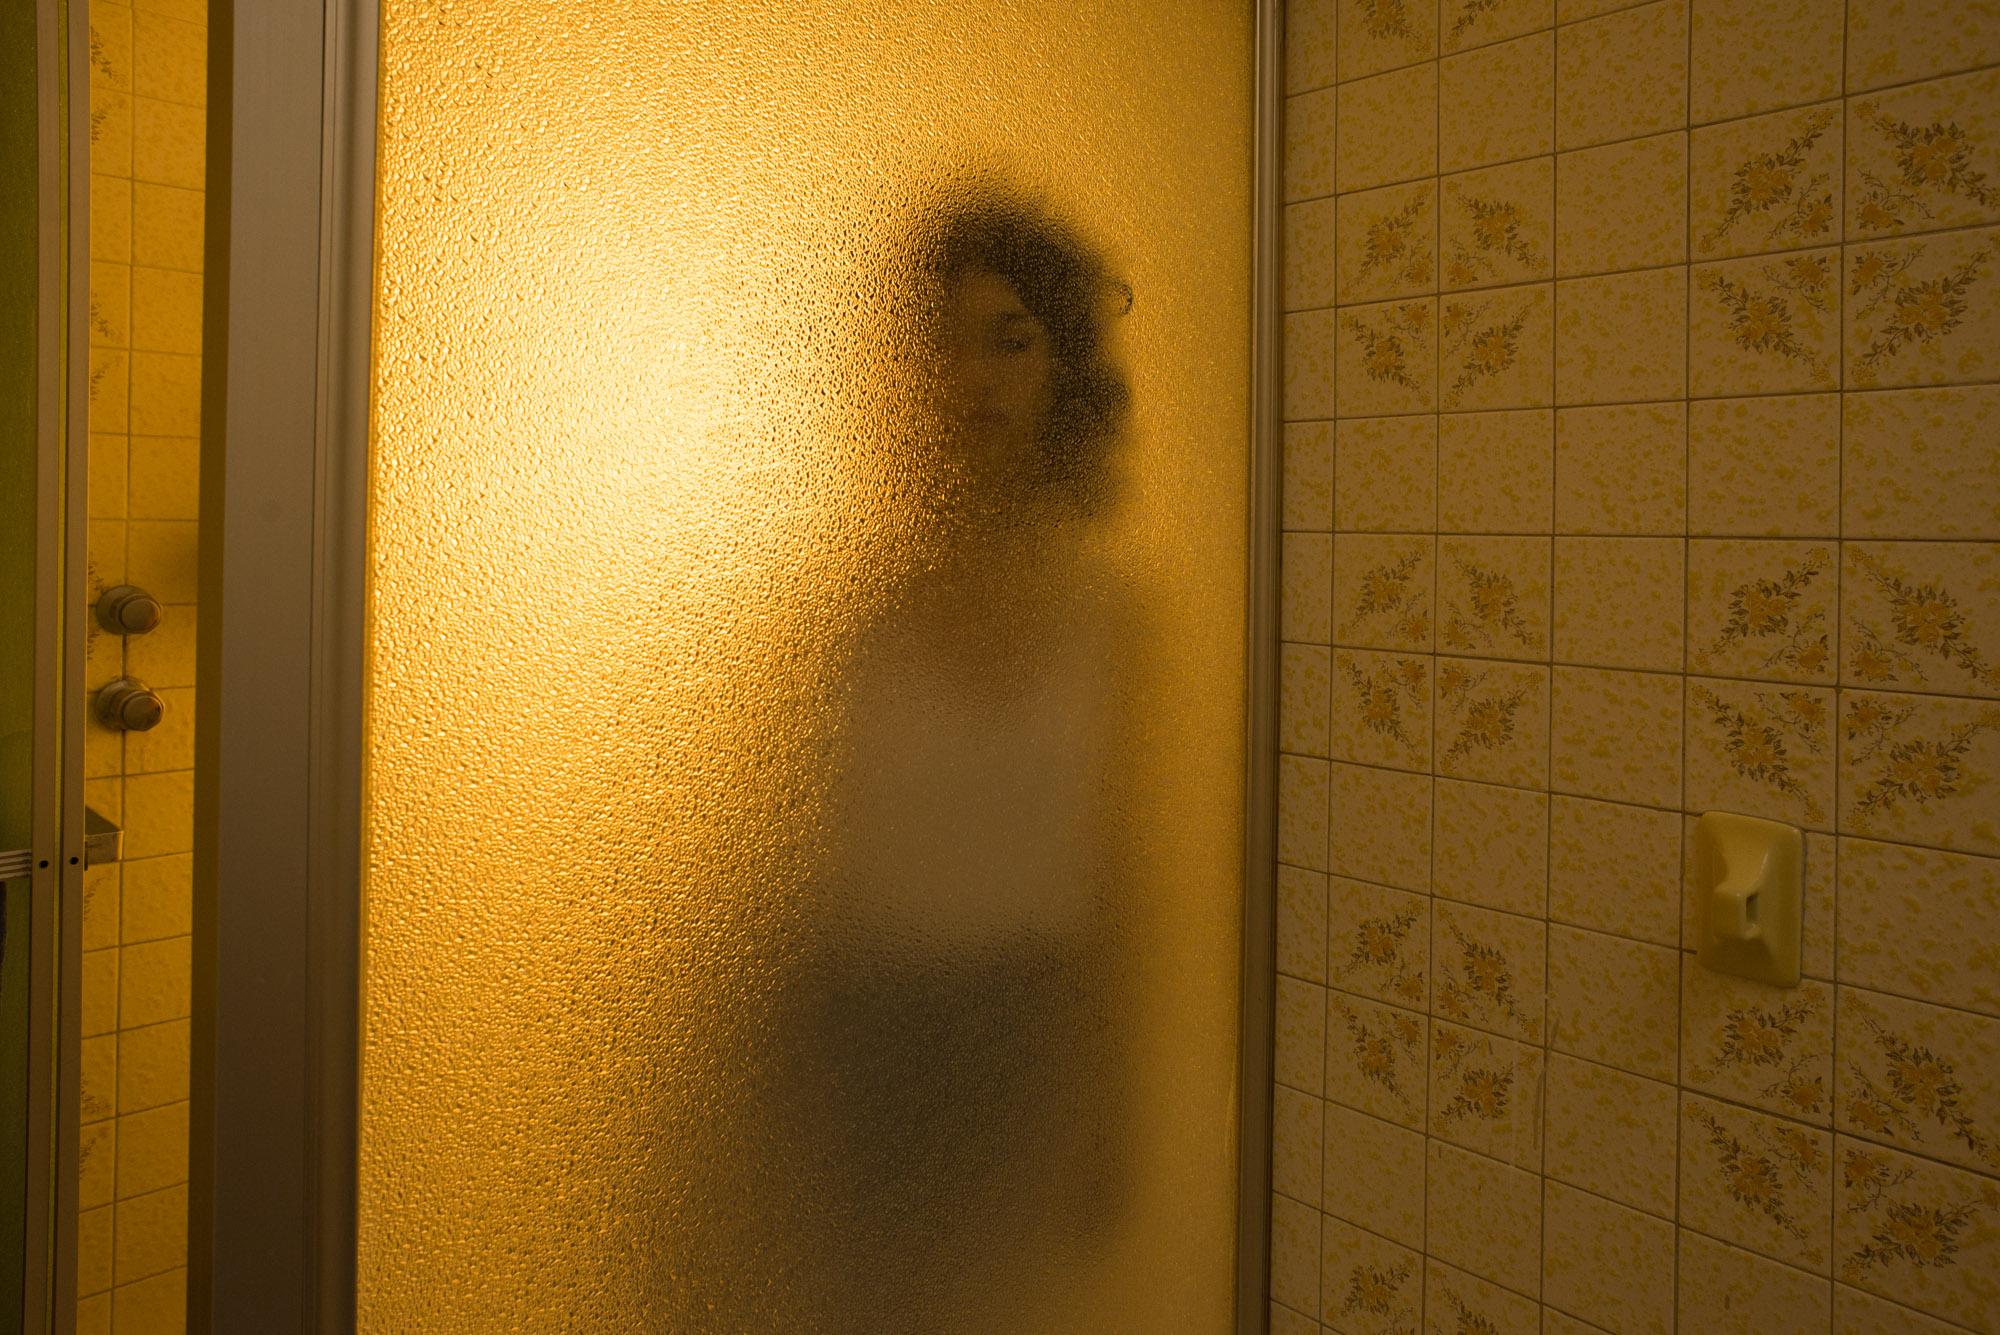 Tania Franco Klein OUR LIFE IN THE SHADOWS C41 Magazine Issue 9 Eros 15